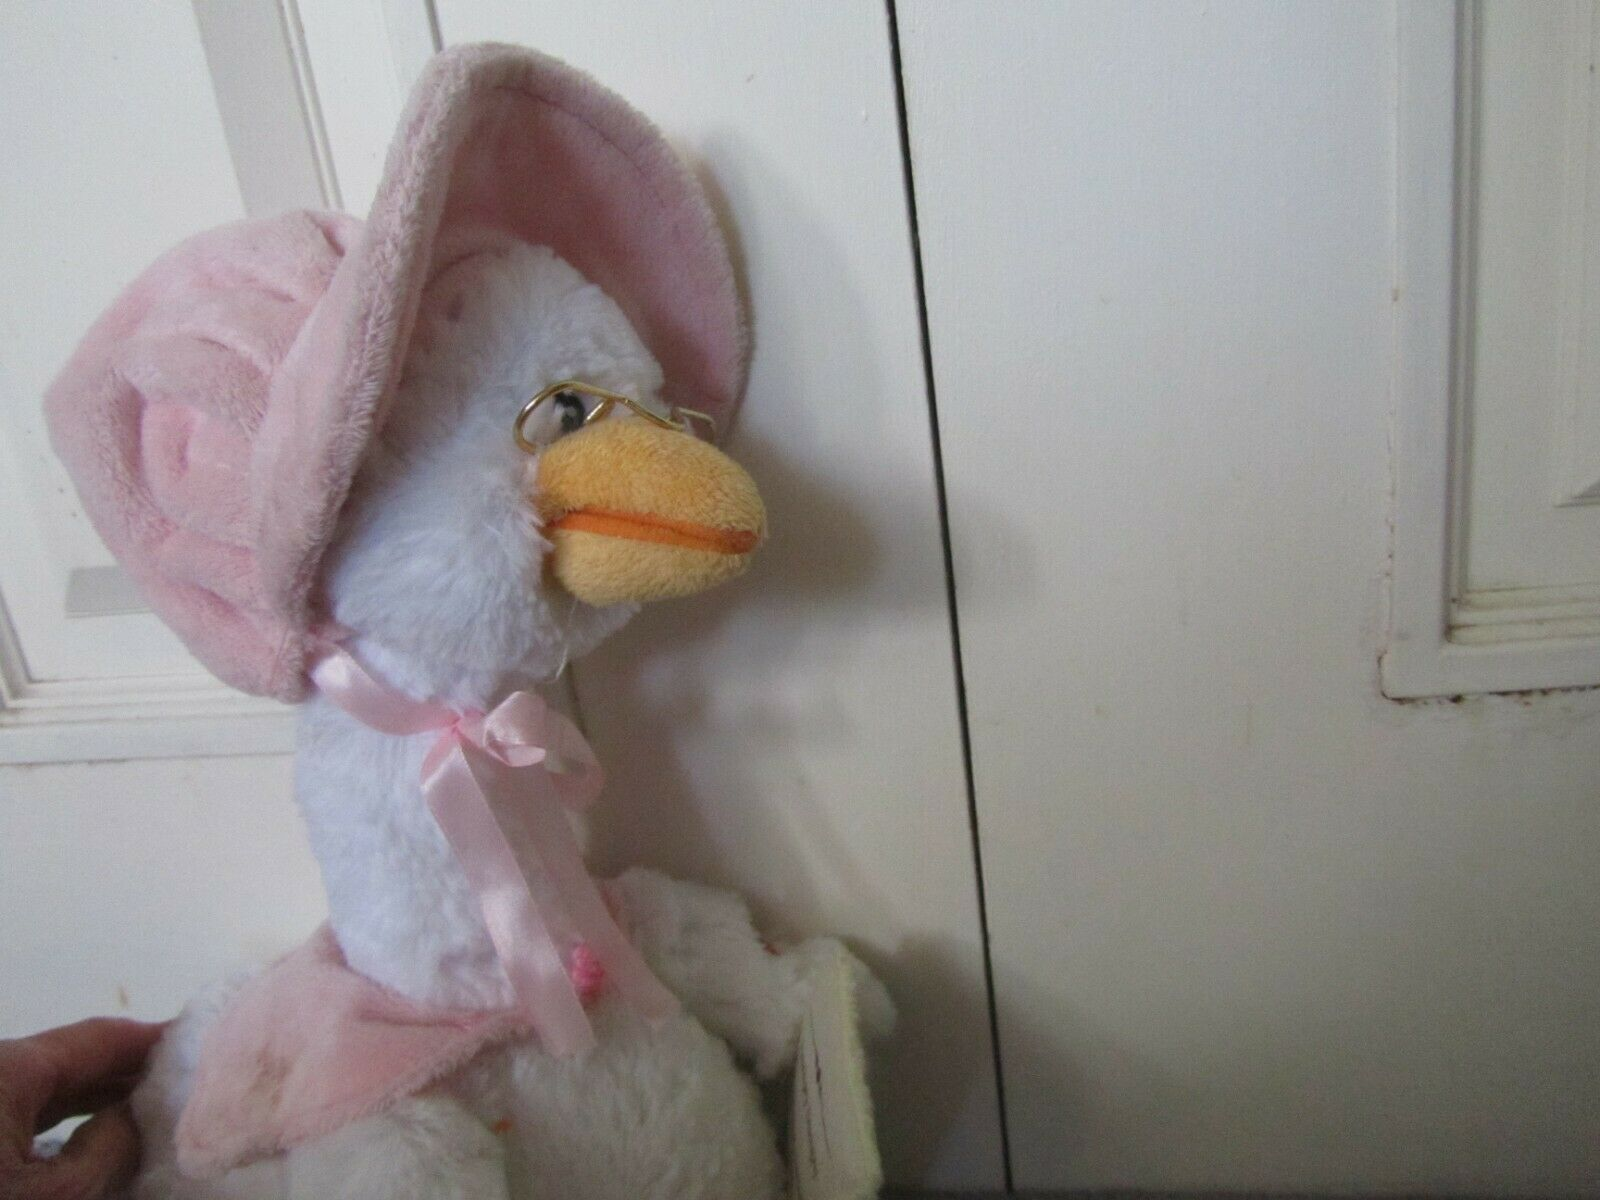 Mother Goose Nursery Rhyme Talking Animated Plush Doll 7 Rhymes Cuddle Barn image 2